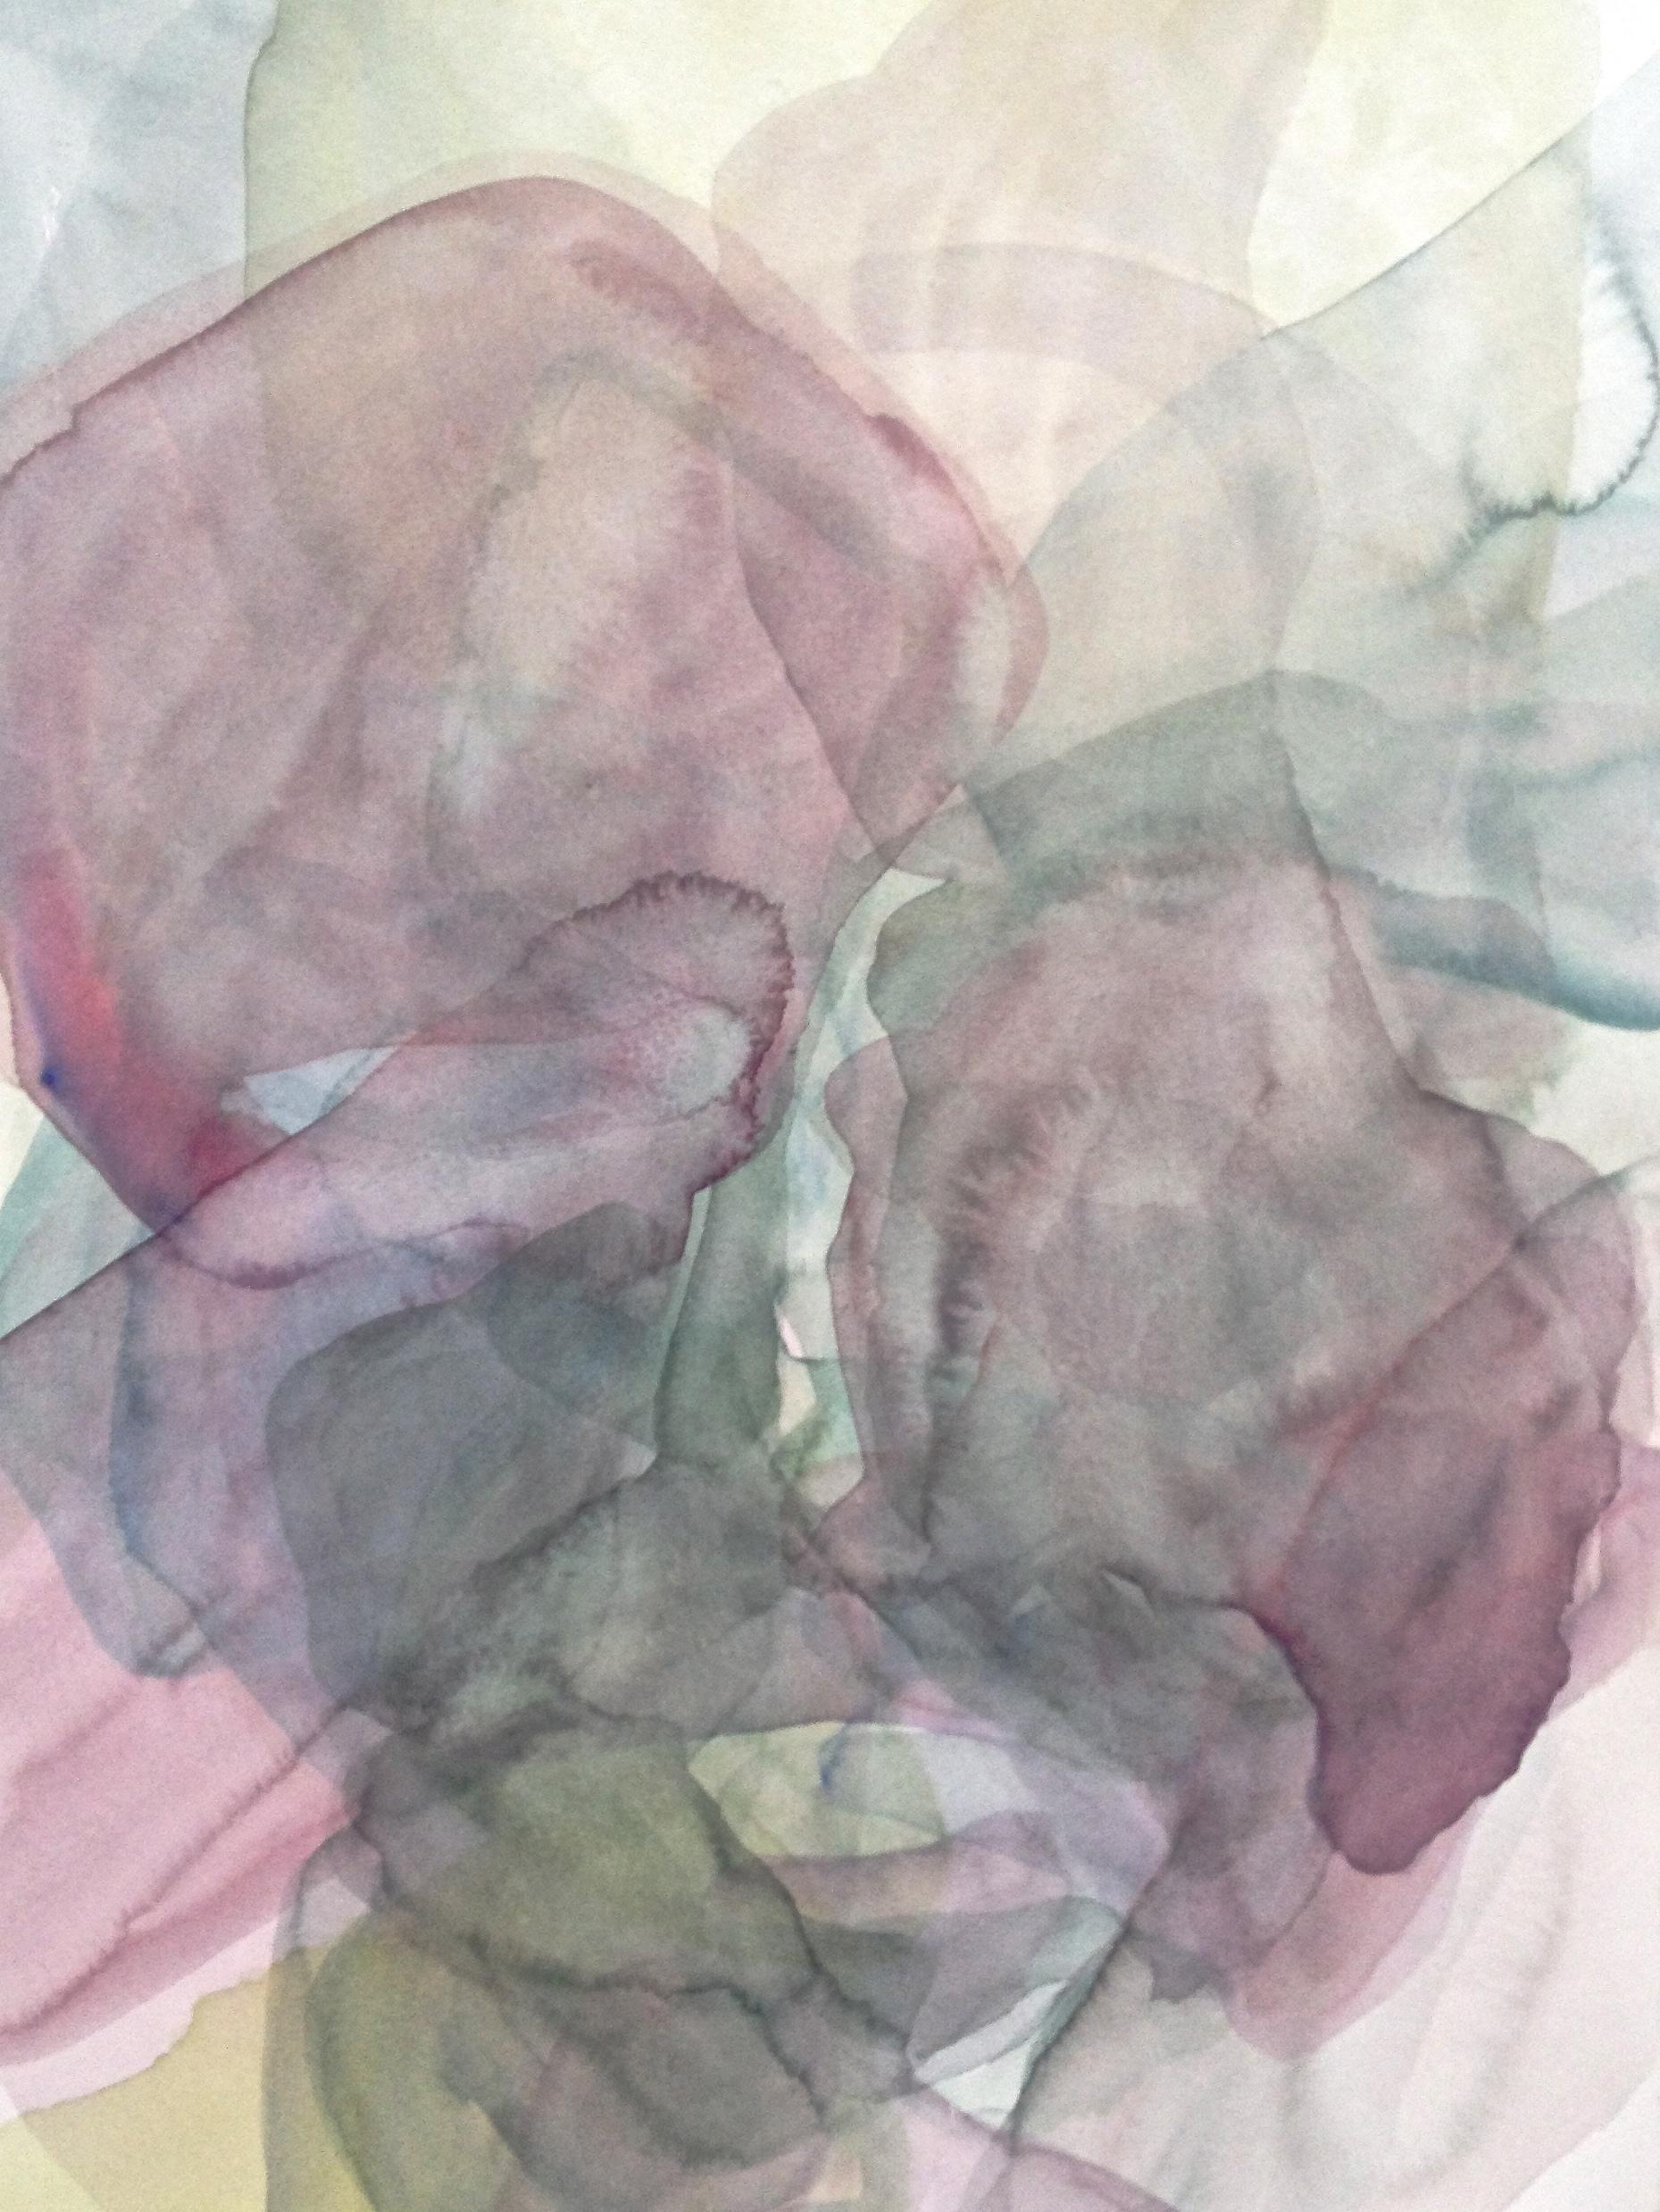 ohne titel, 2014, Aquarell auf Papier, Format A3